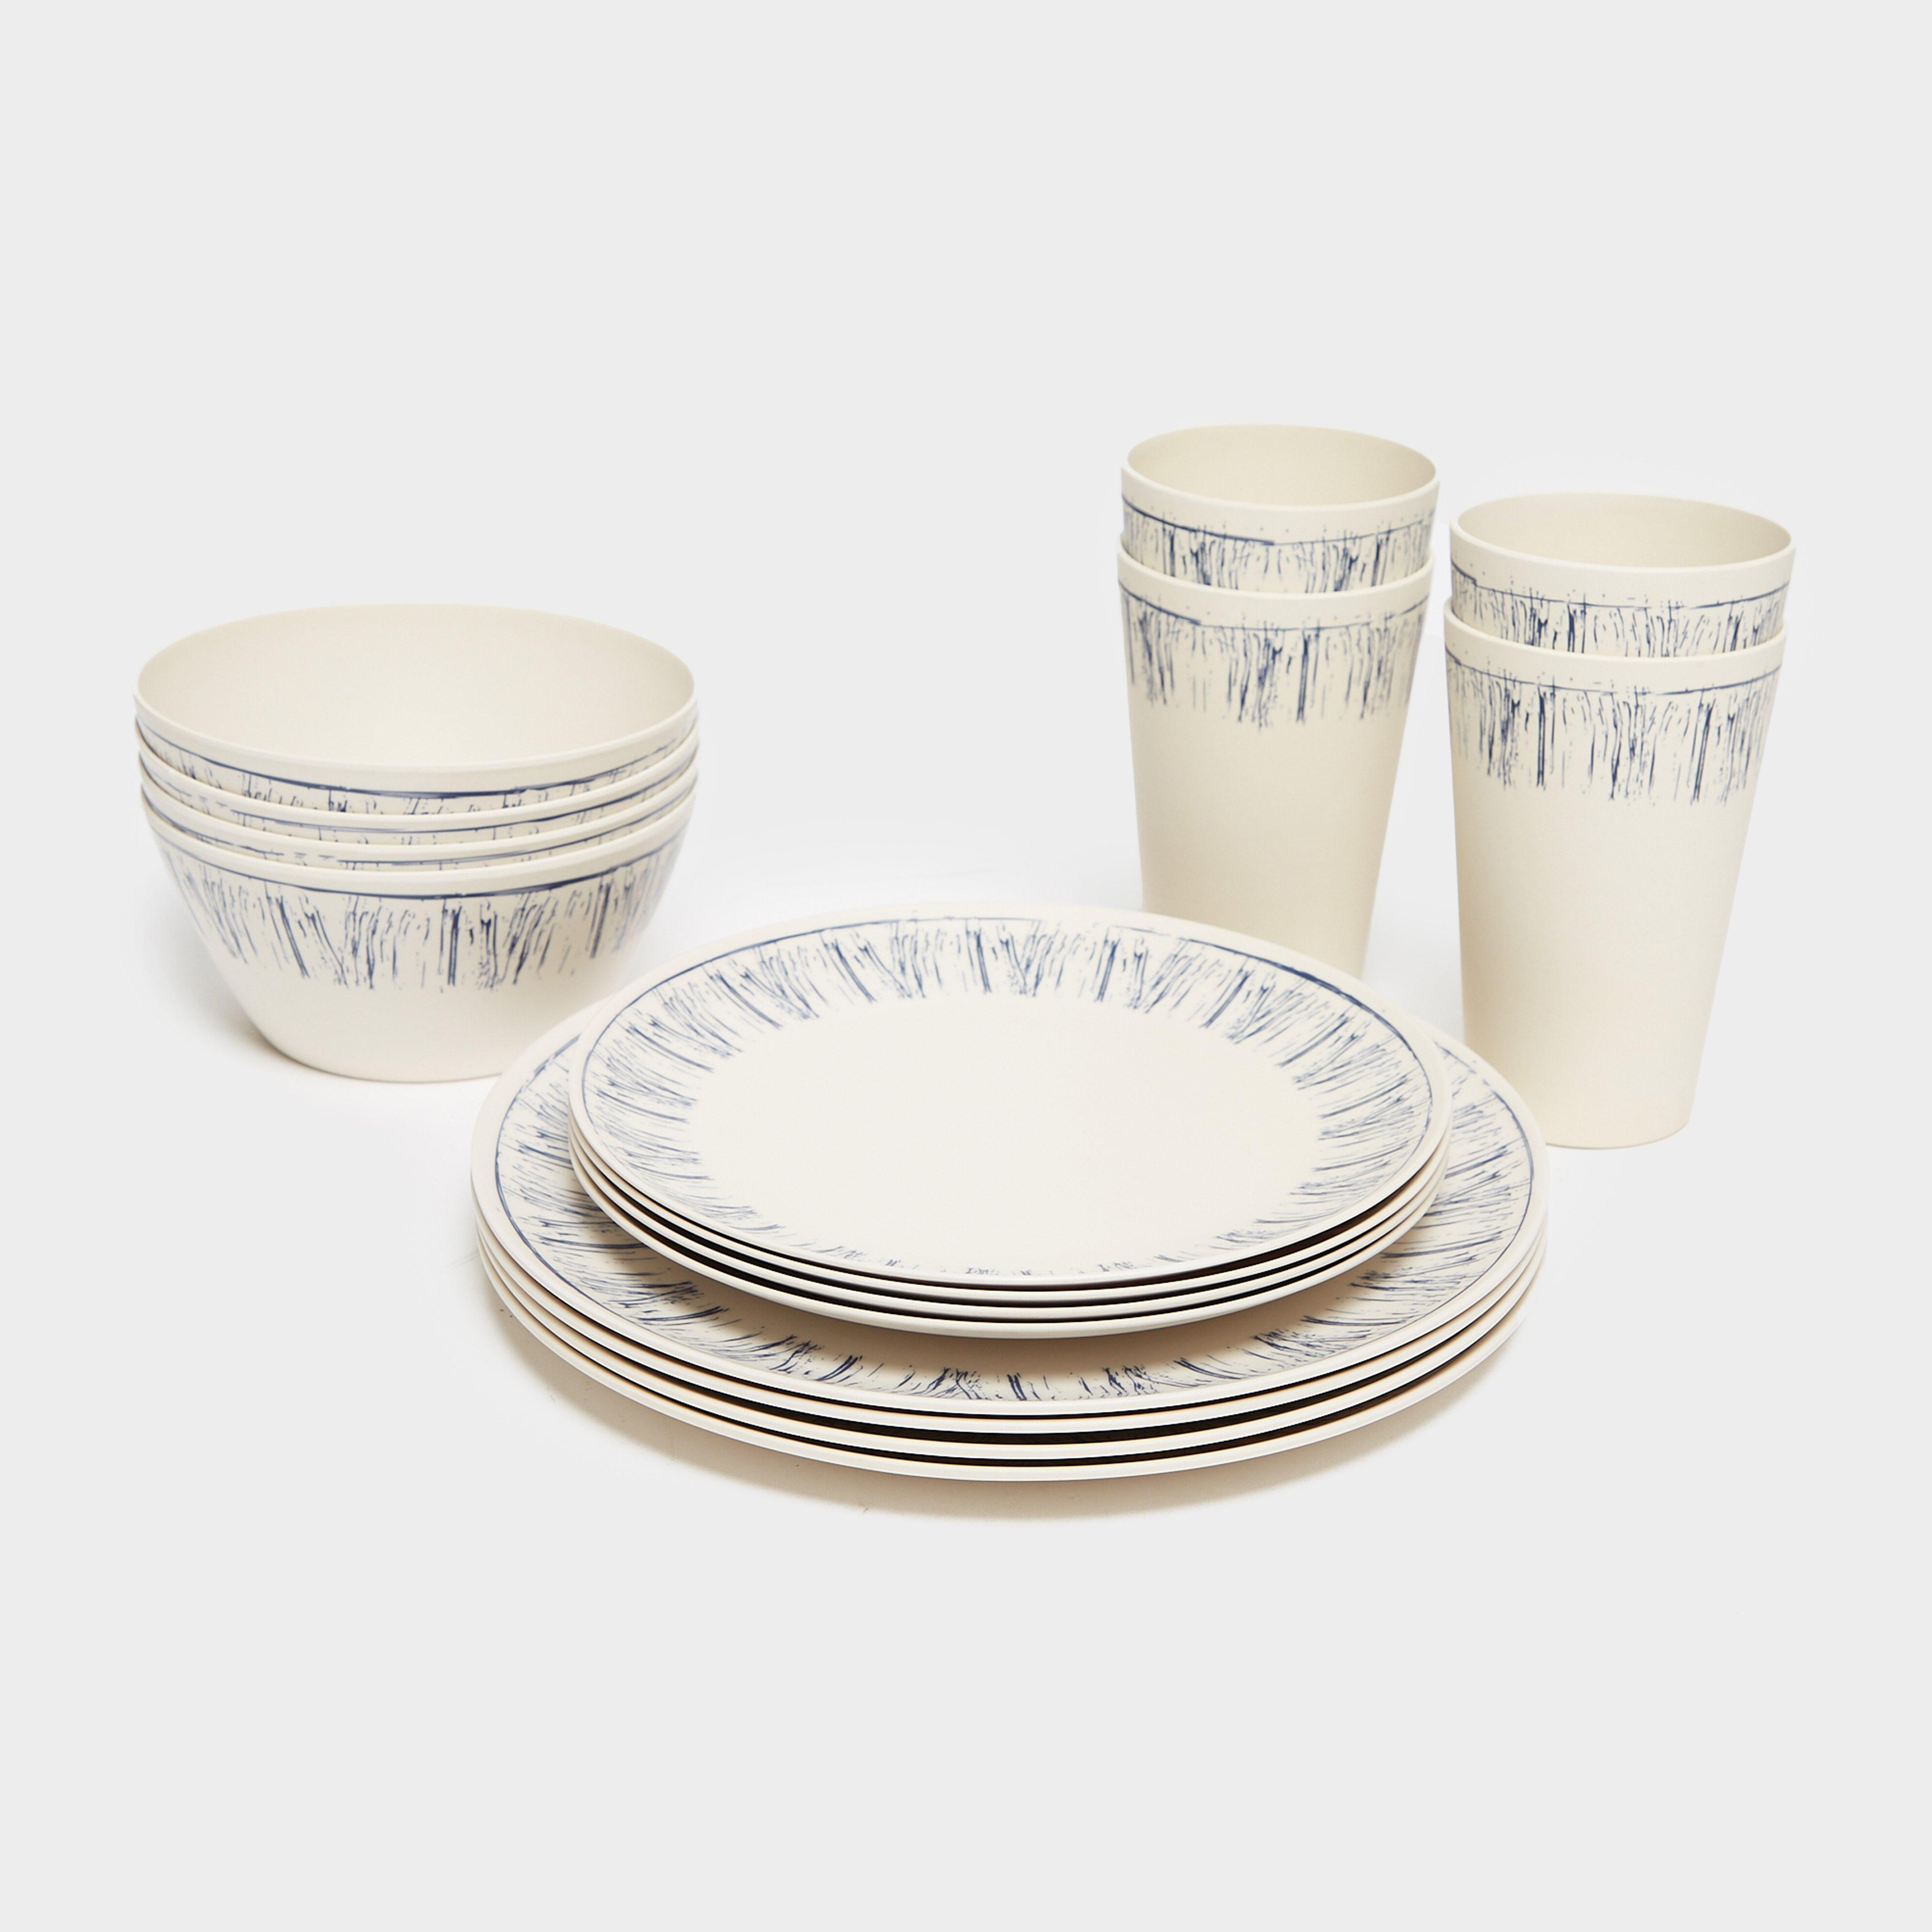 HI-GEAR 16 Piece Bamboo Tableware Set, Cream/Cream